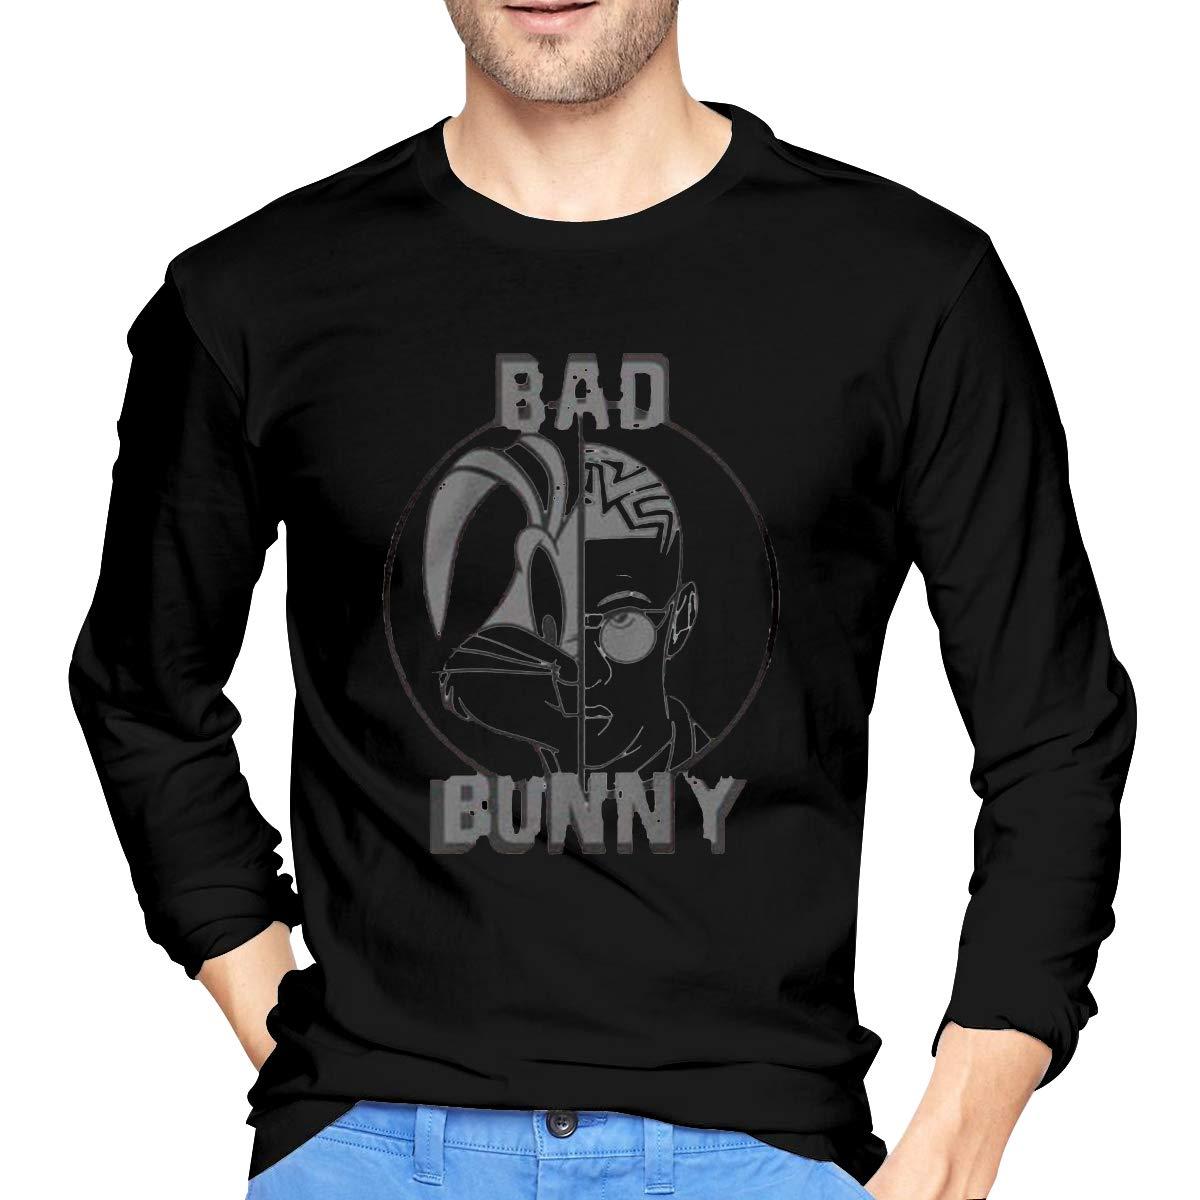 Round Neck Bad Bunny Unique Classic Fashion Style 6552 Shirts